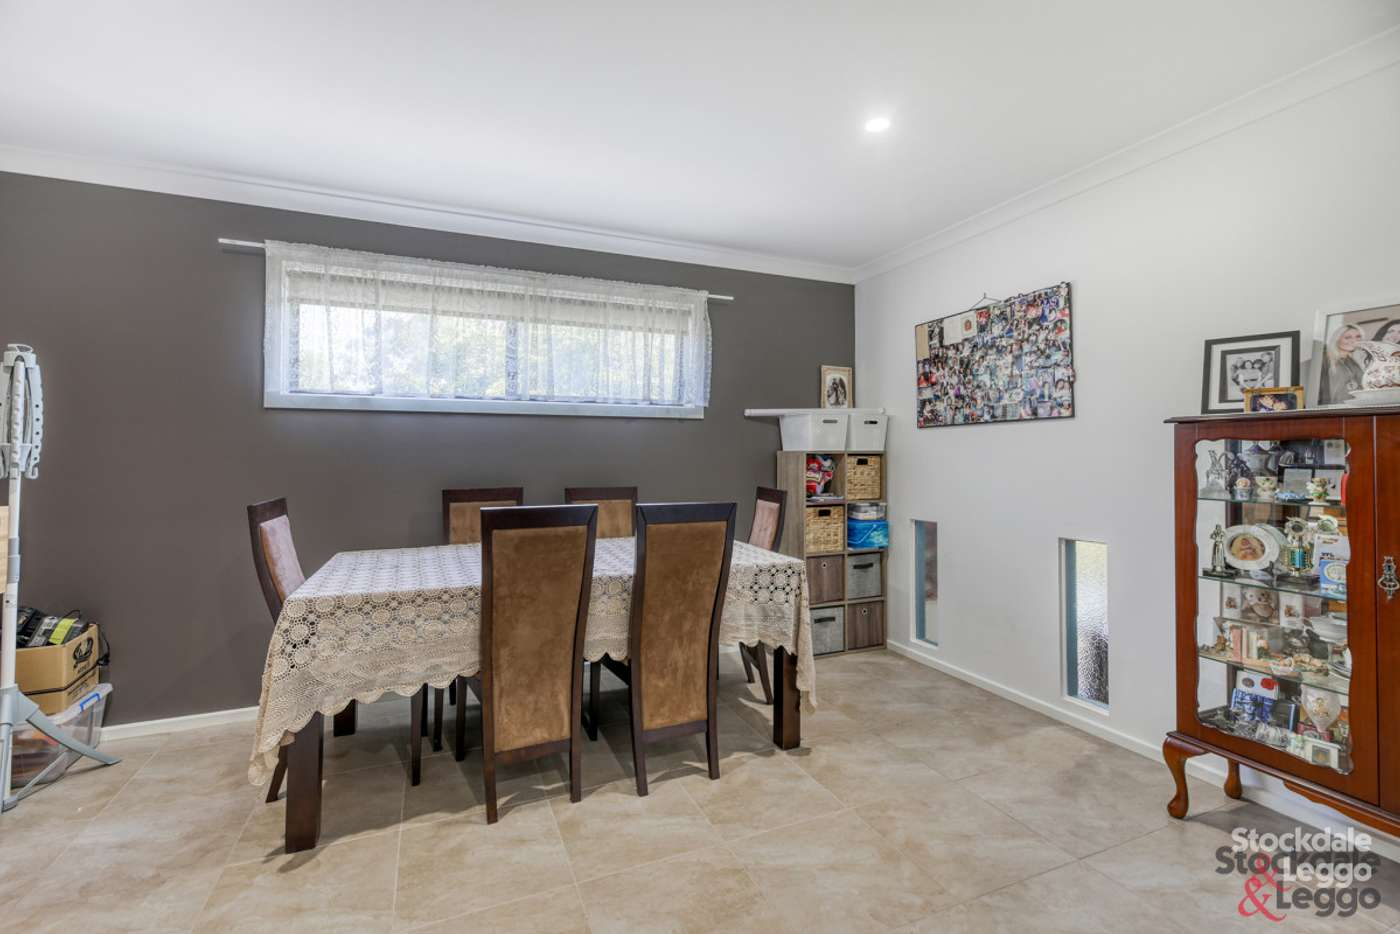 Sixth view of Homely house listing, 37 Smallburn Avenue, Newborough VIC 3825